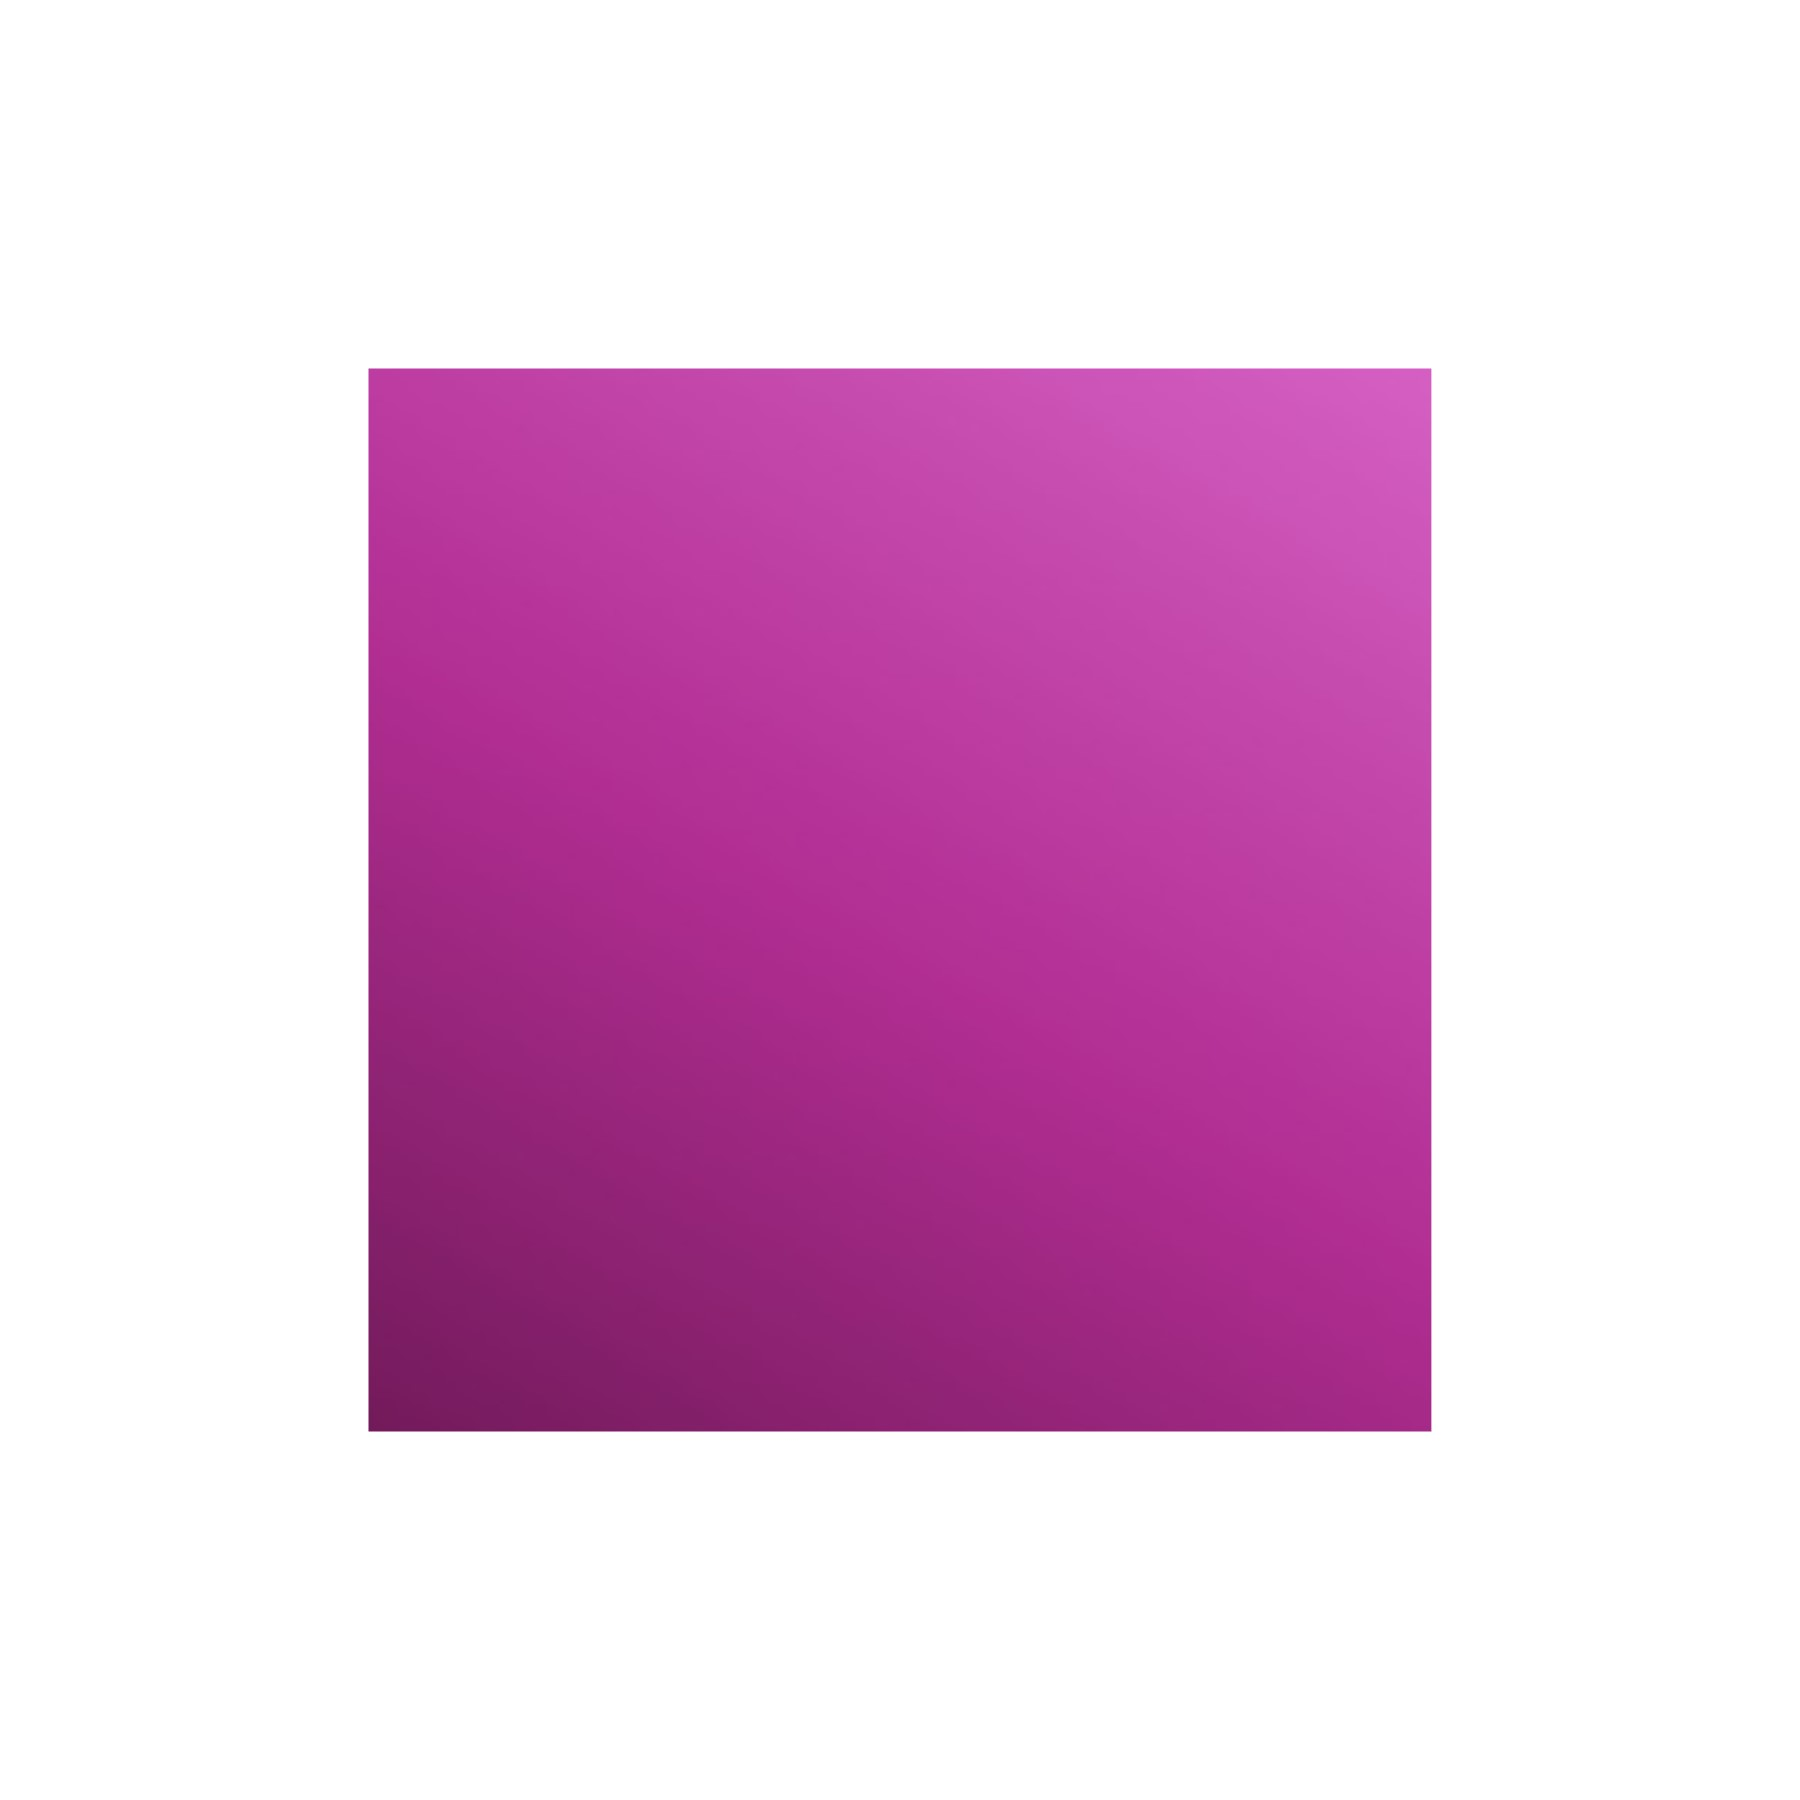 Vinilo textil Easyweed® Electric hoja 30 x 38 cm Cereza